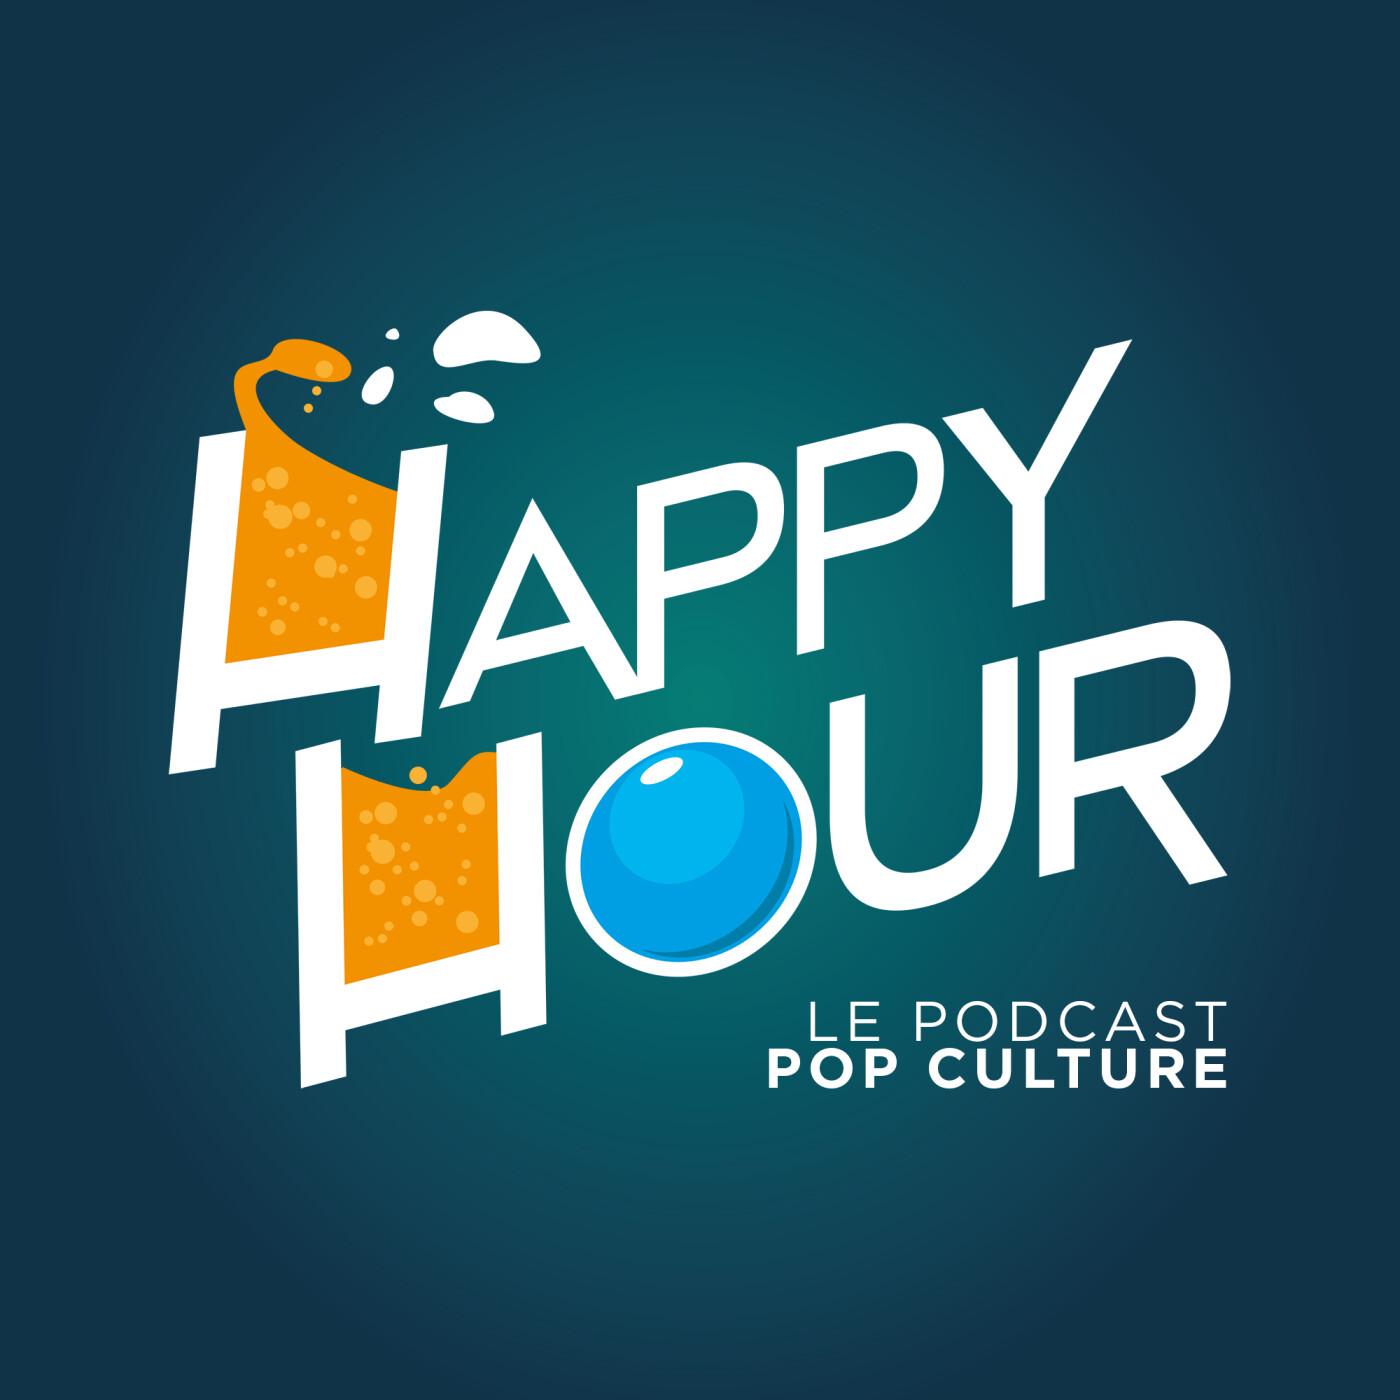 Happy Hour #58 : Paerish, Framing Britney Spears, Star Wars, Valheim, The Nightingale...